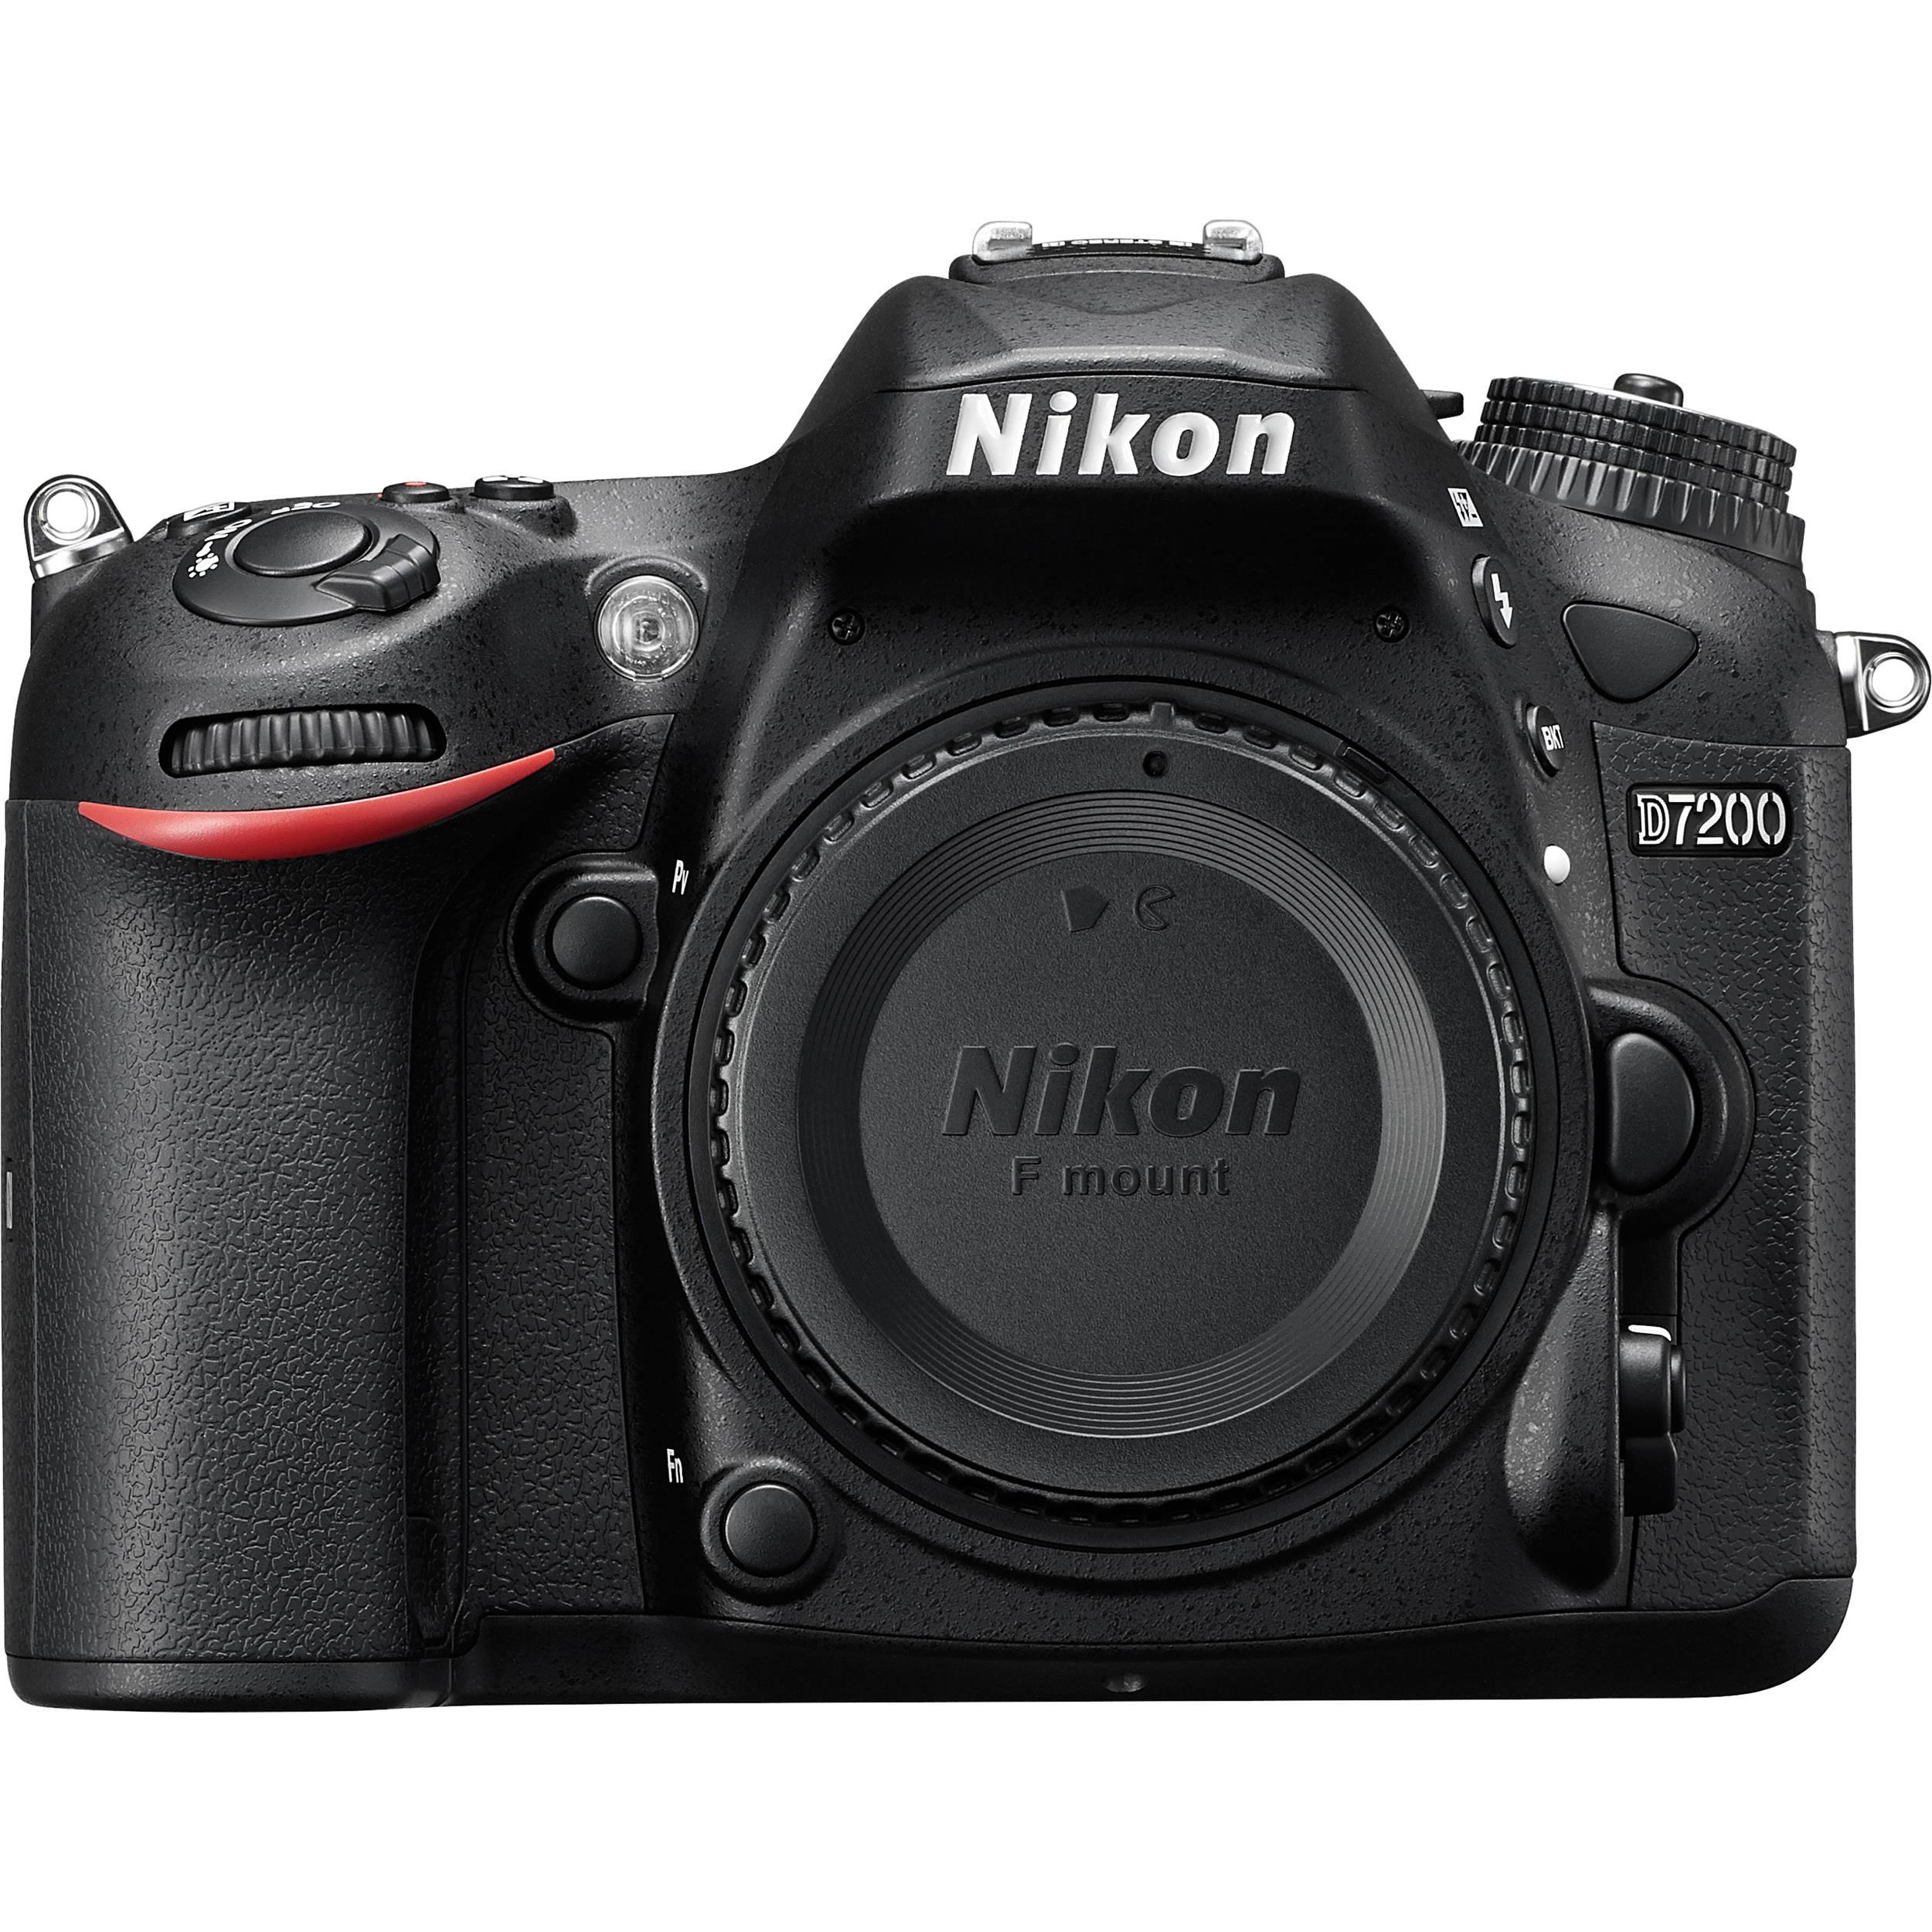 7347518991 Nikon D7200 DSLR Camera (Nikon D7200 Body) 1554 B H Photo Video